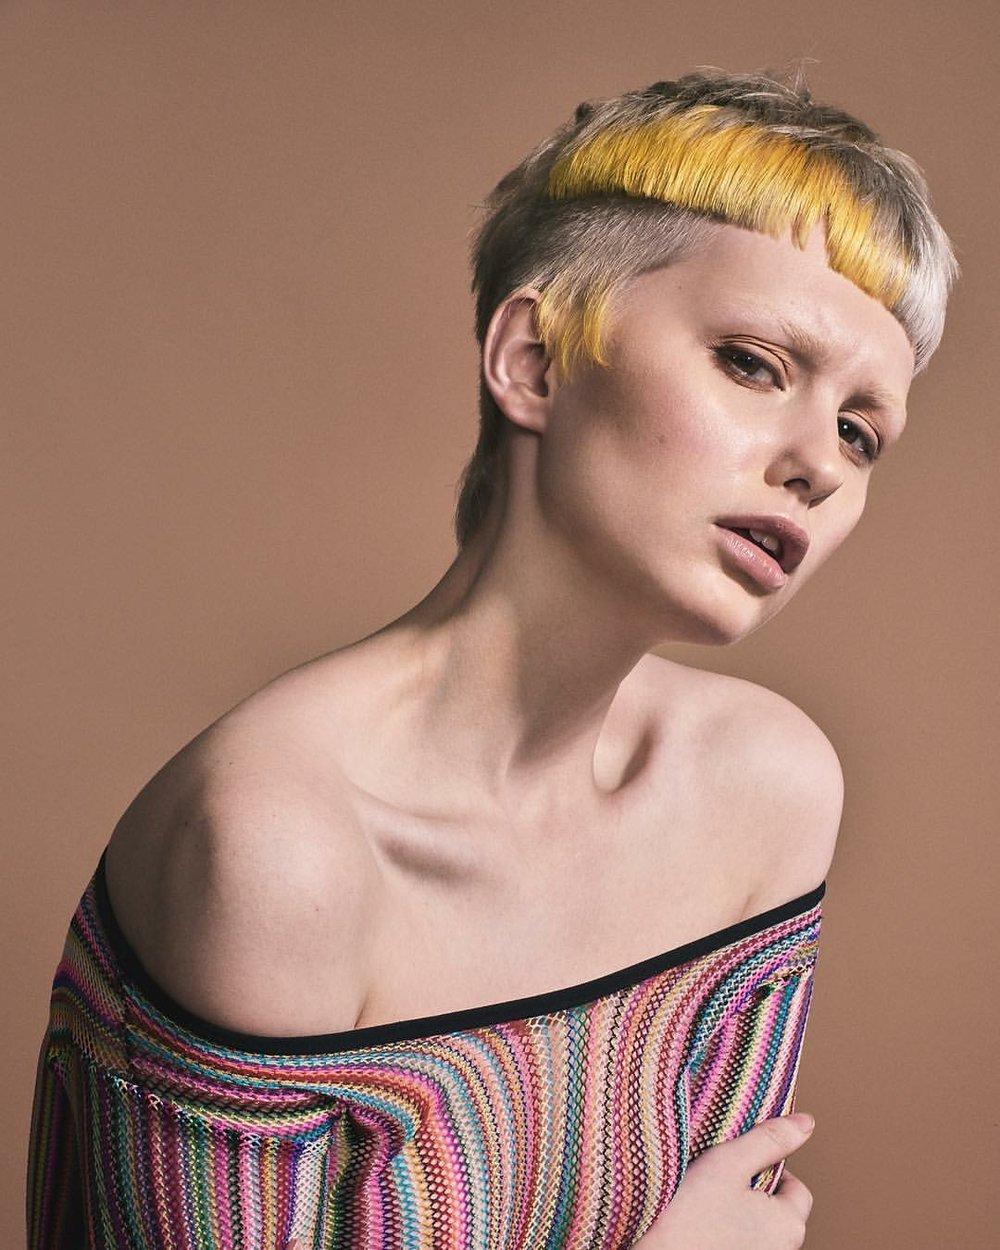 Barry Maddocks Hair Colourist